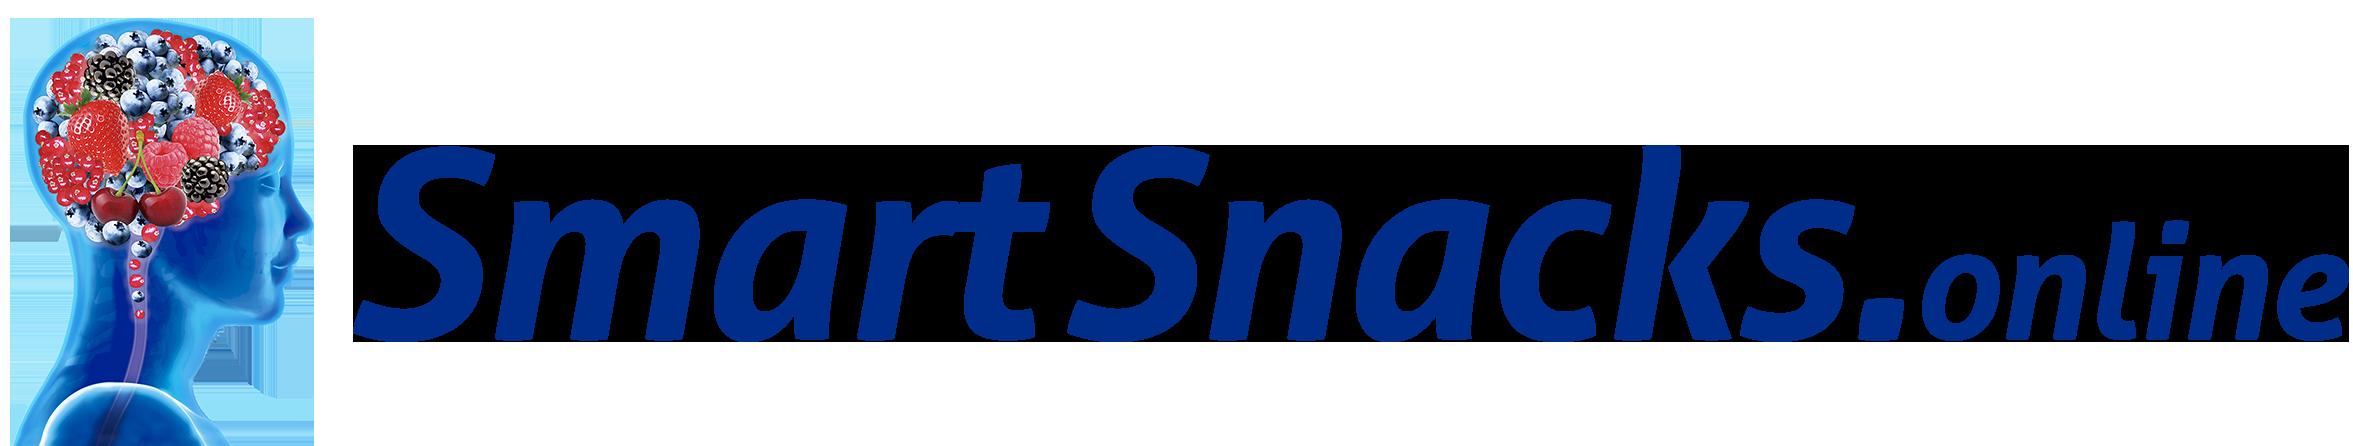 SmartSnacks